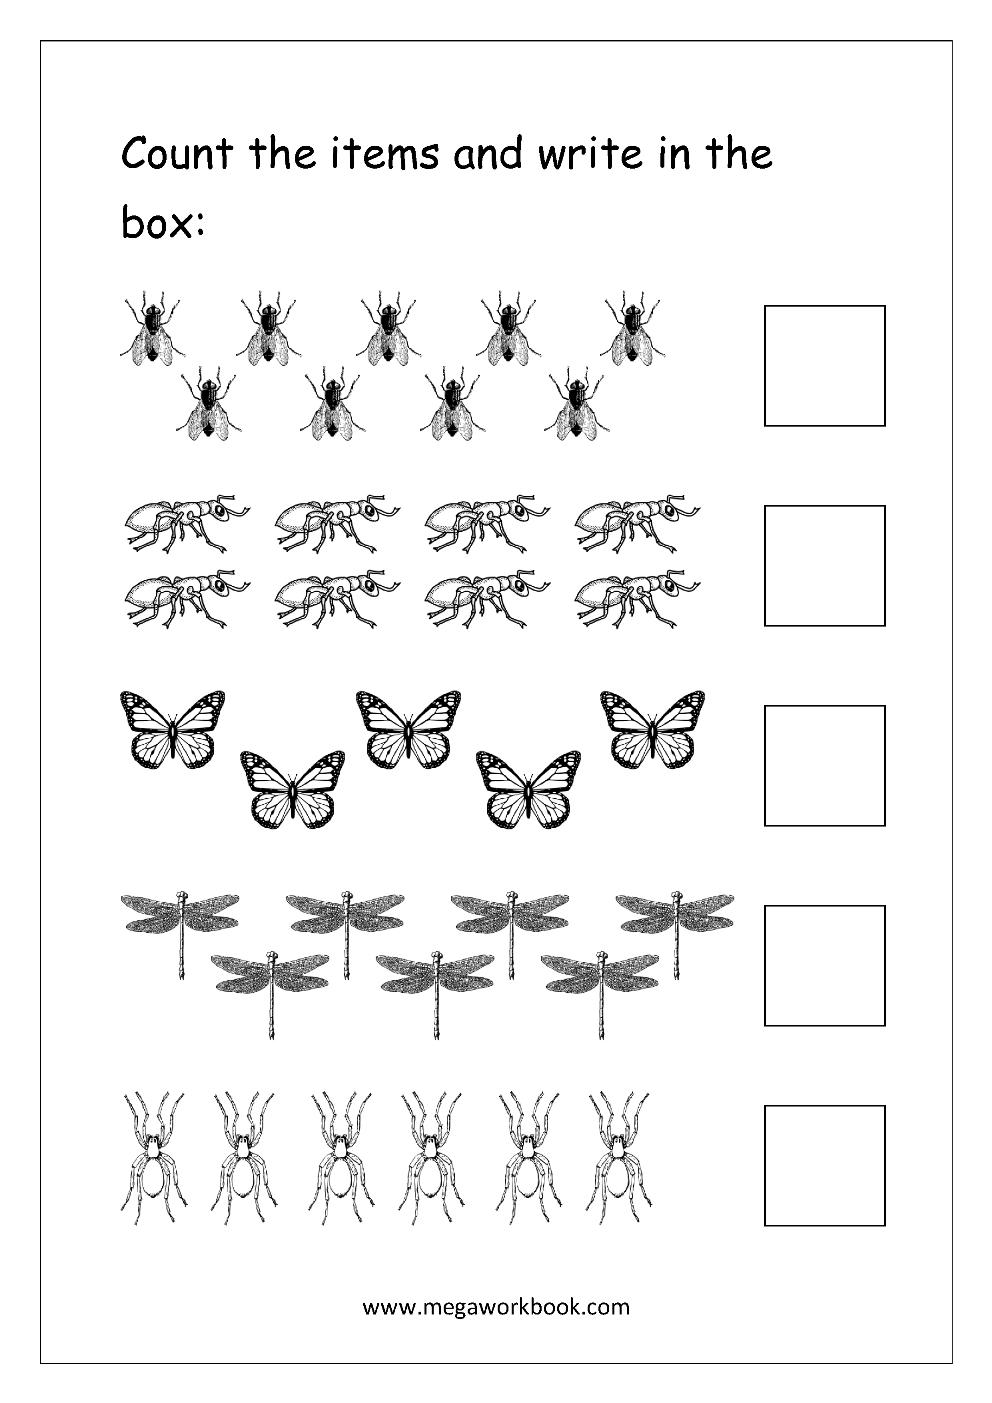 Free Printable Number Counting Worksheets - Count And Match - Count | Counting Worksheets 1 20 Printable